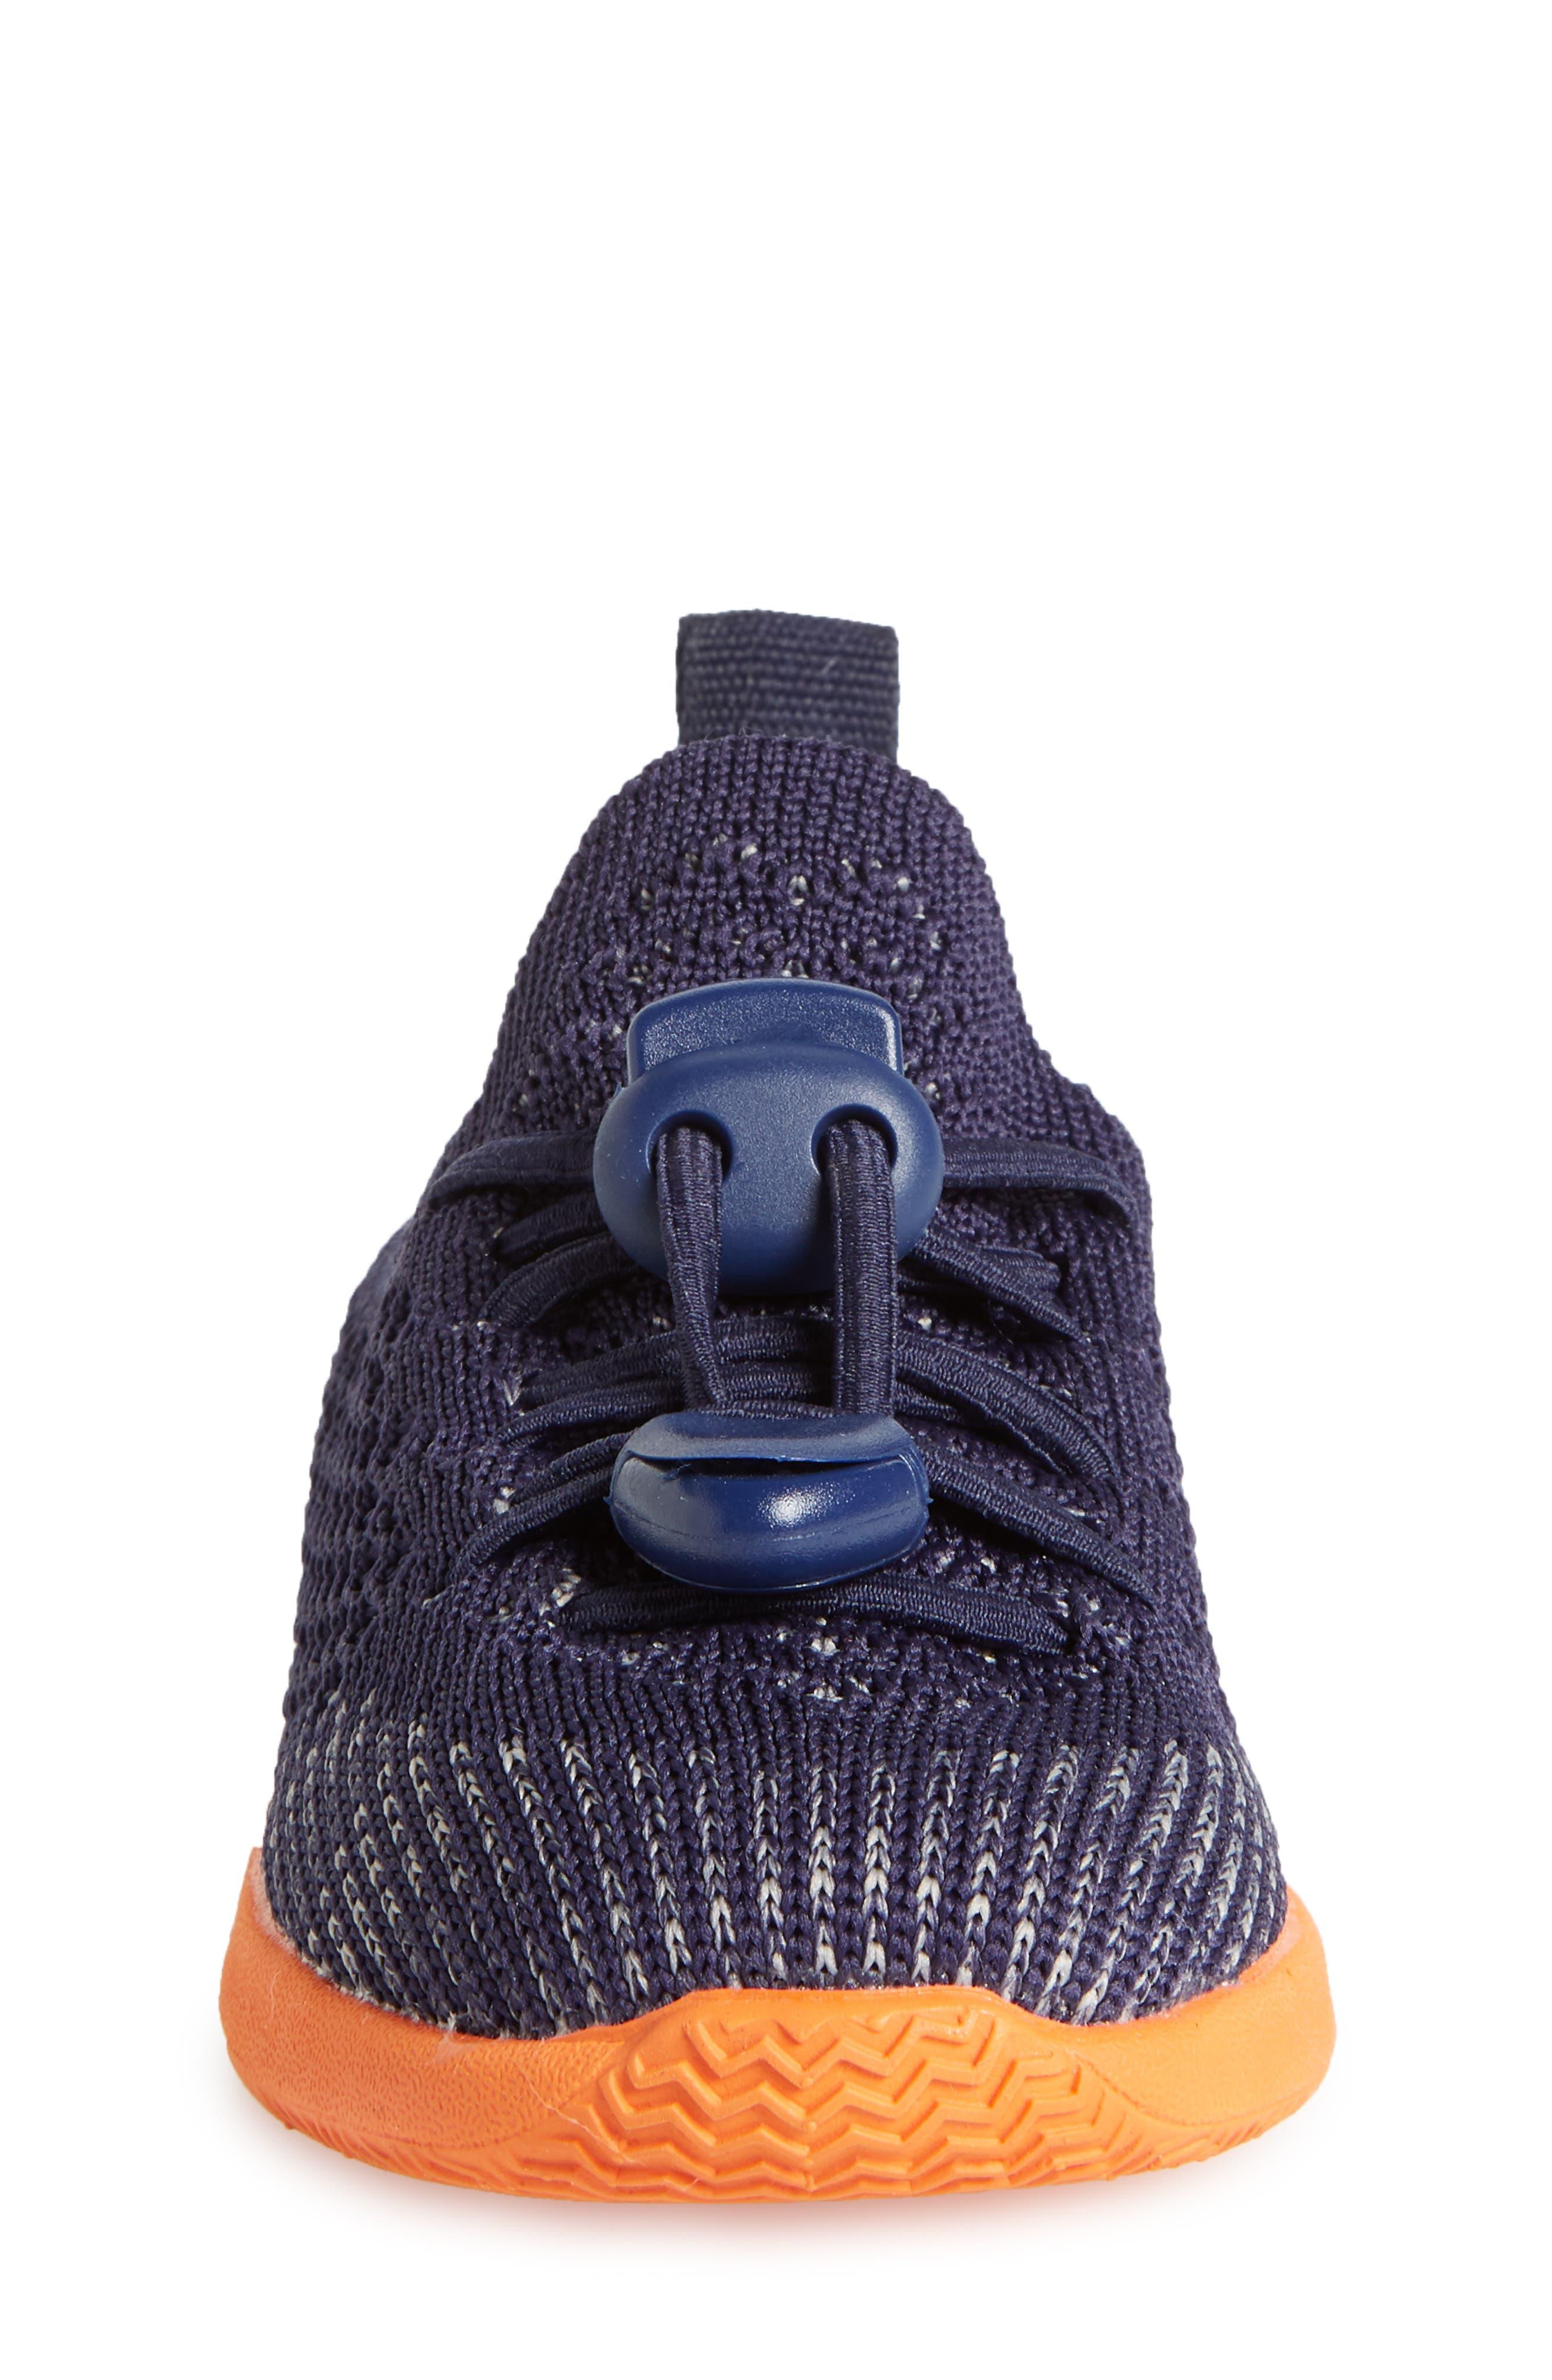 AP Mercury LiteKnit Sneaker,                             Alternate thumbnail 4, color,                             REGATTA BLUE/ SUNSET ORANGE